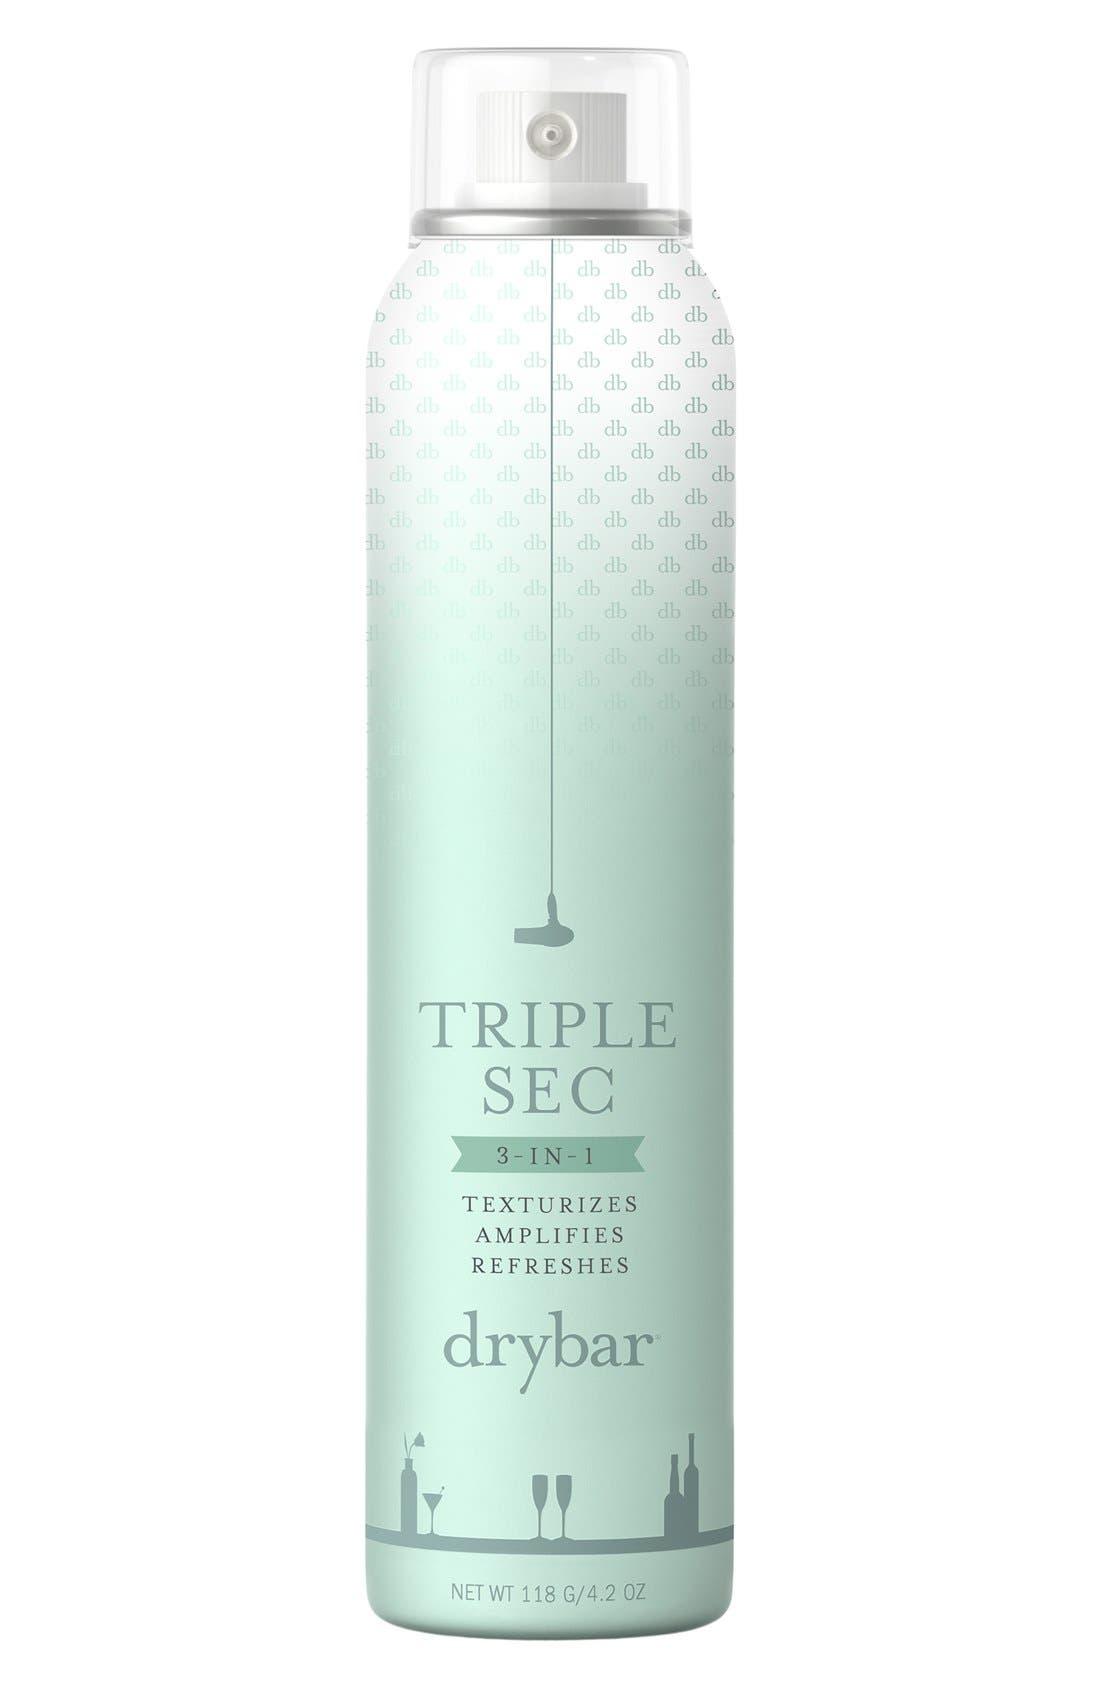 Drybar 'Triple Sec' 3-in-1 Texturizer